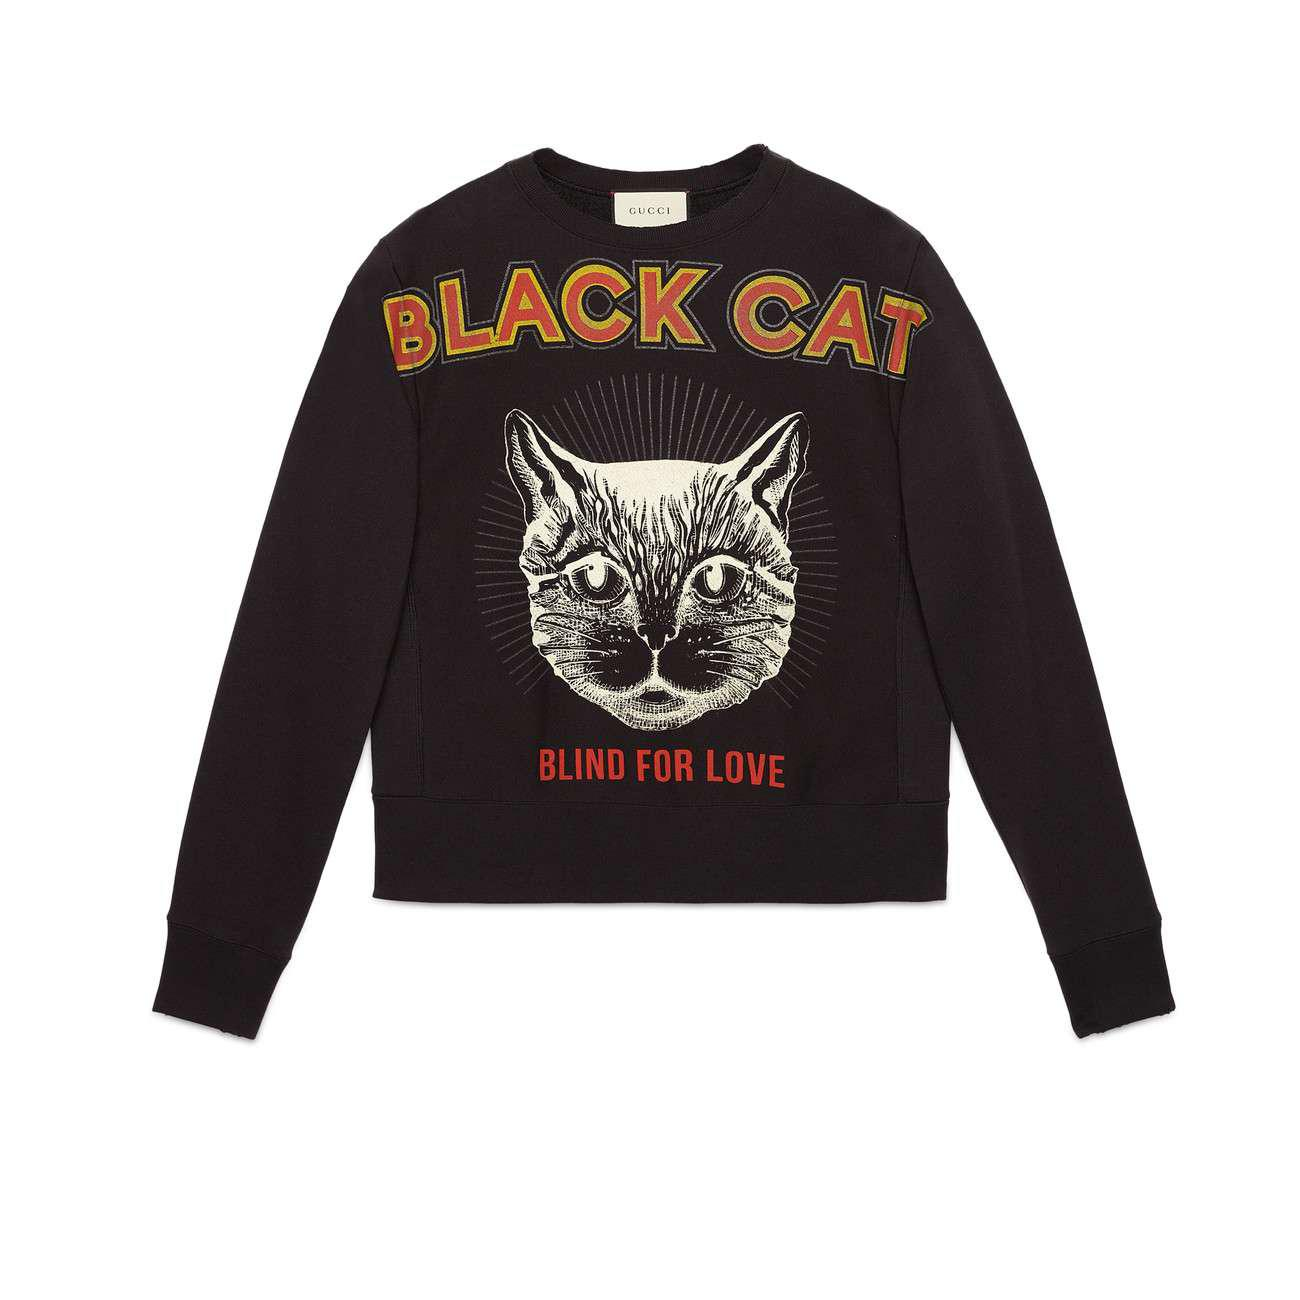 9cbdffee7 Gucci Cotton Sweatshirt With Black Cat Print in Black for Men - Lyst